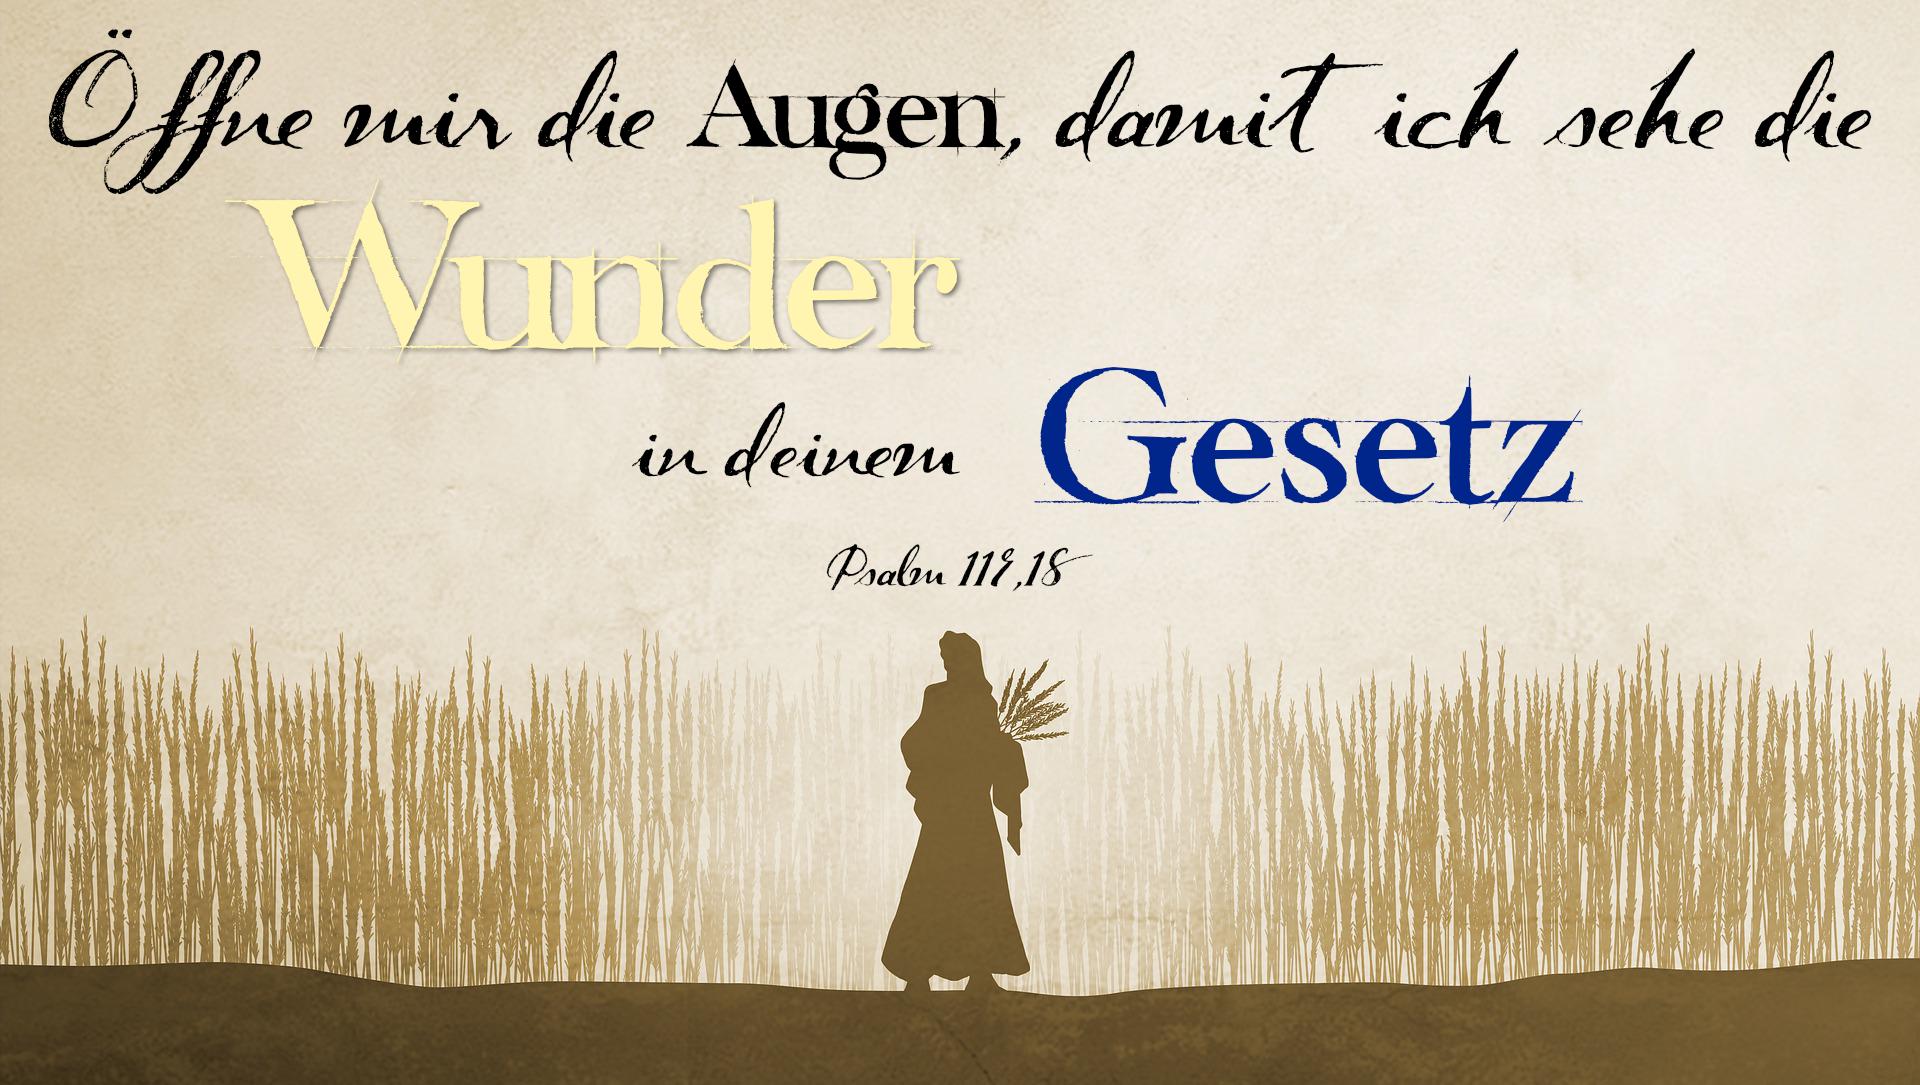 Psalm 119,18